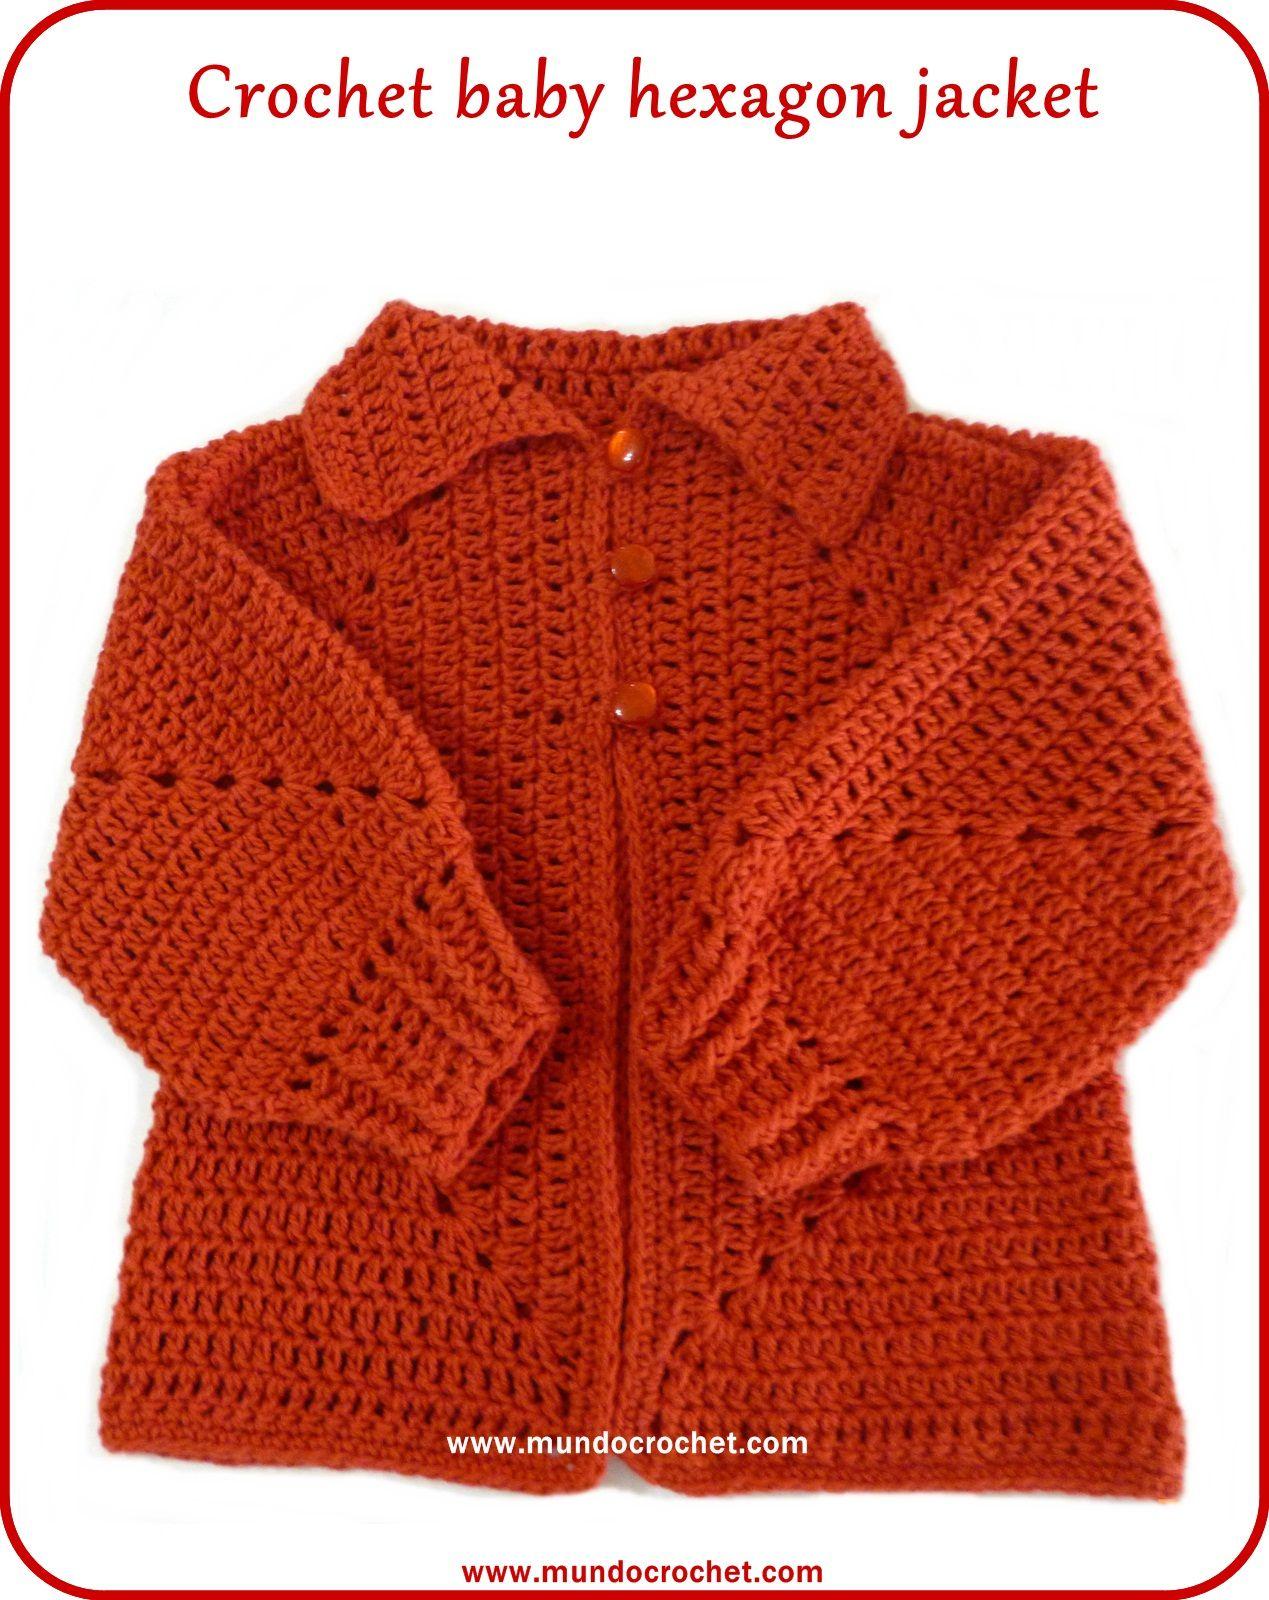 Crochet hexagon jacket/Crochet hexagon sweater-free pattern ...